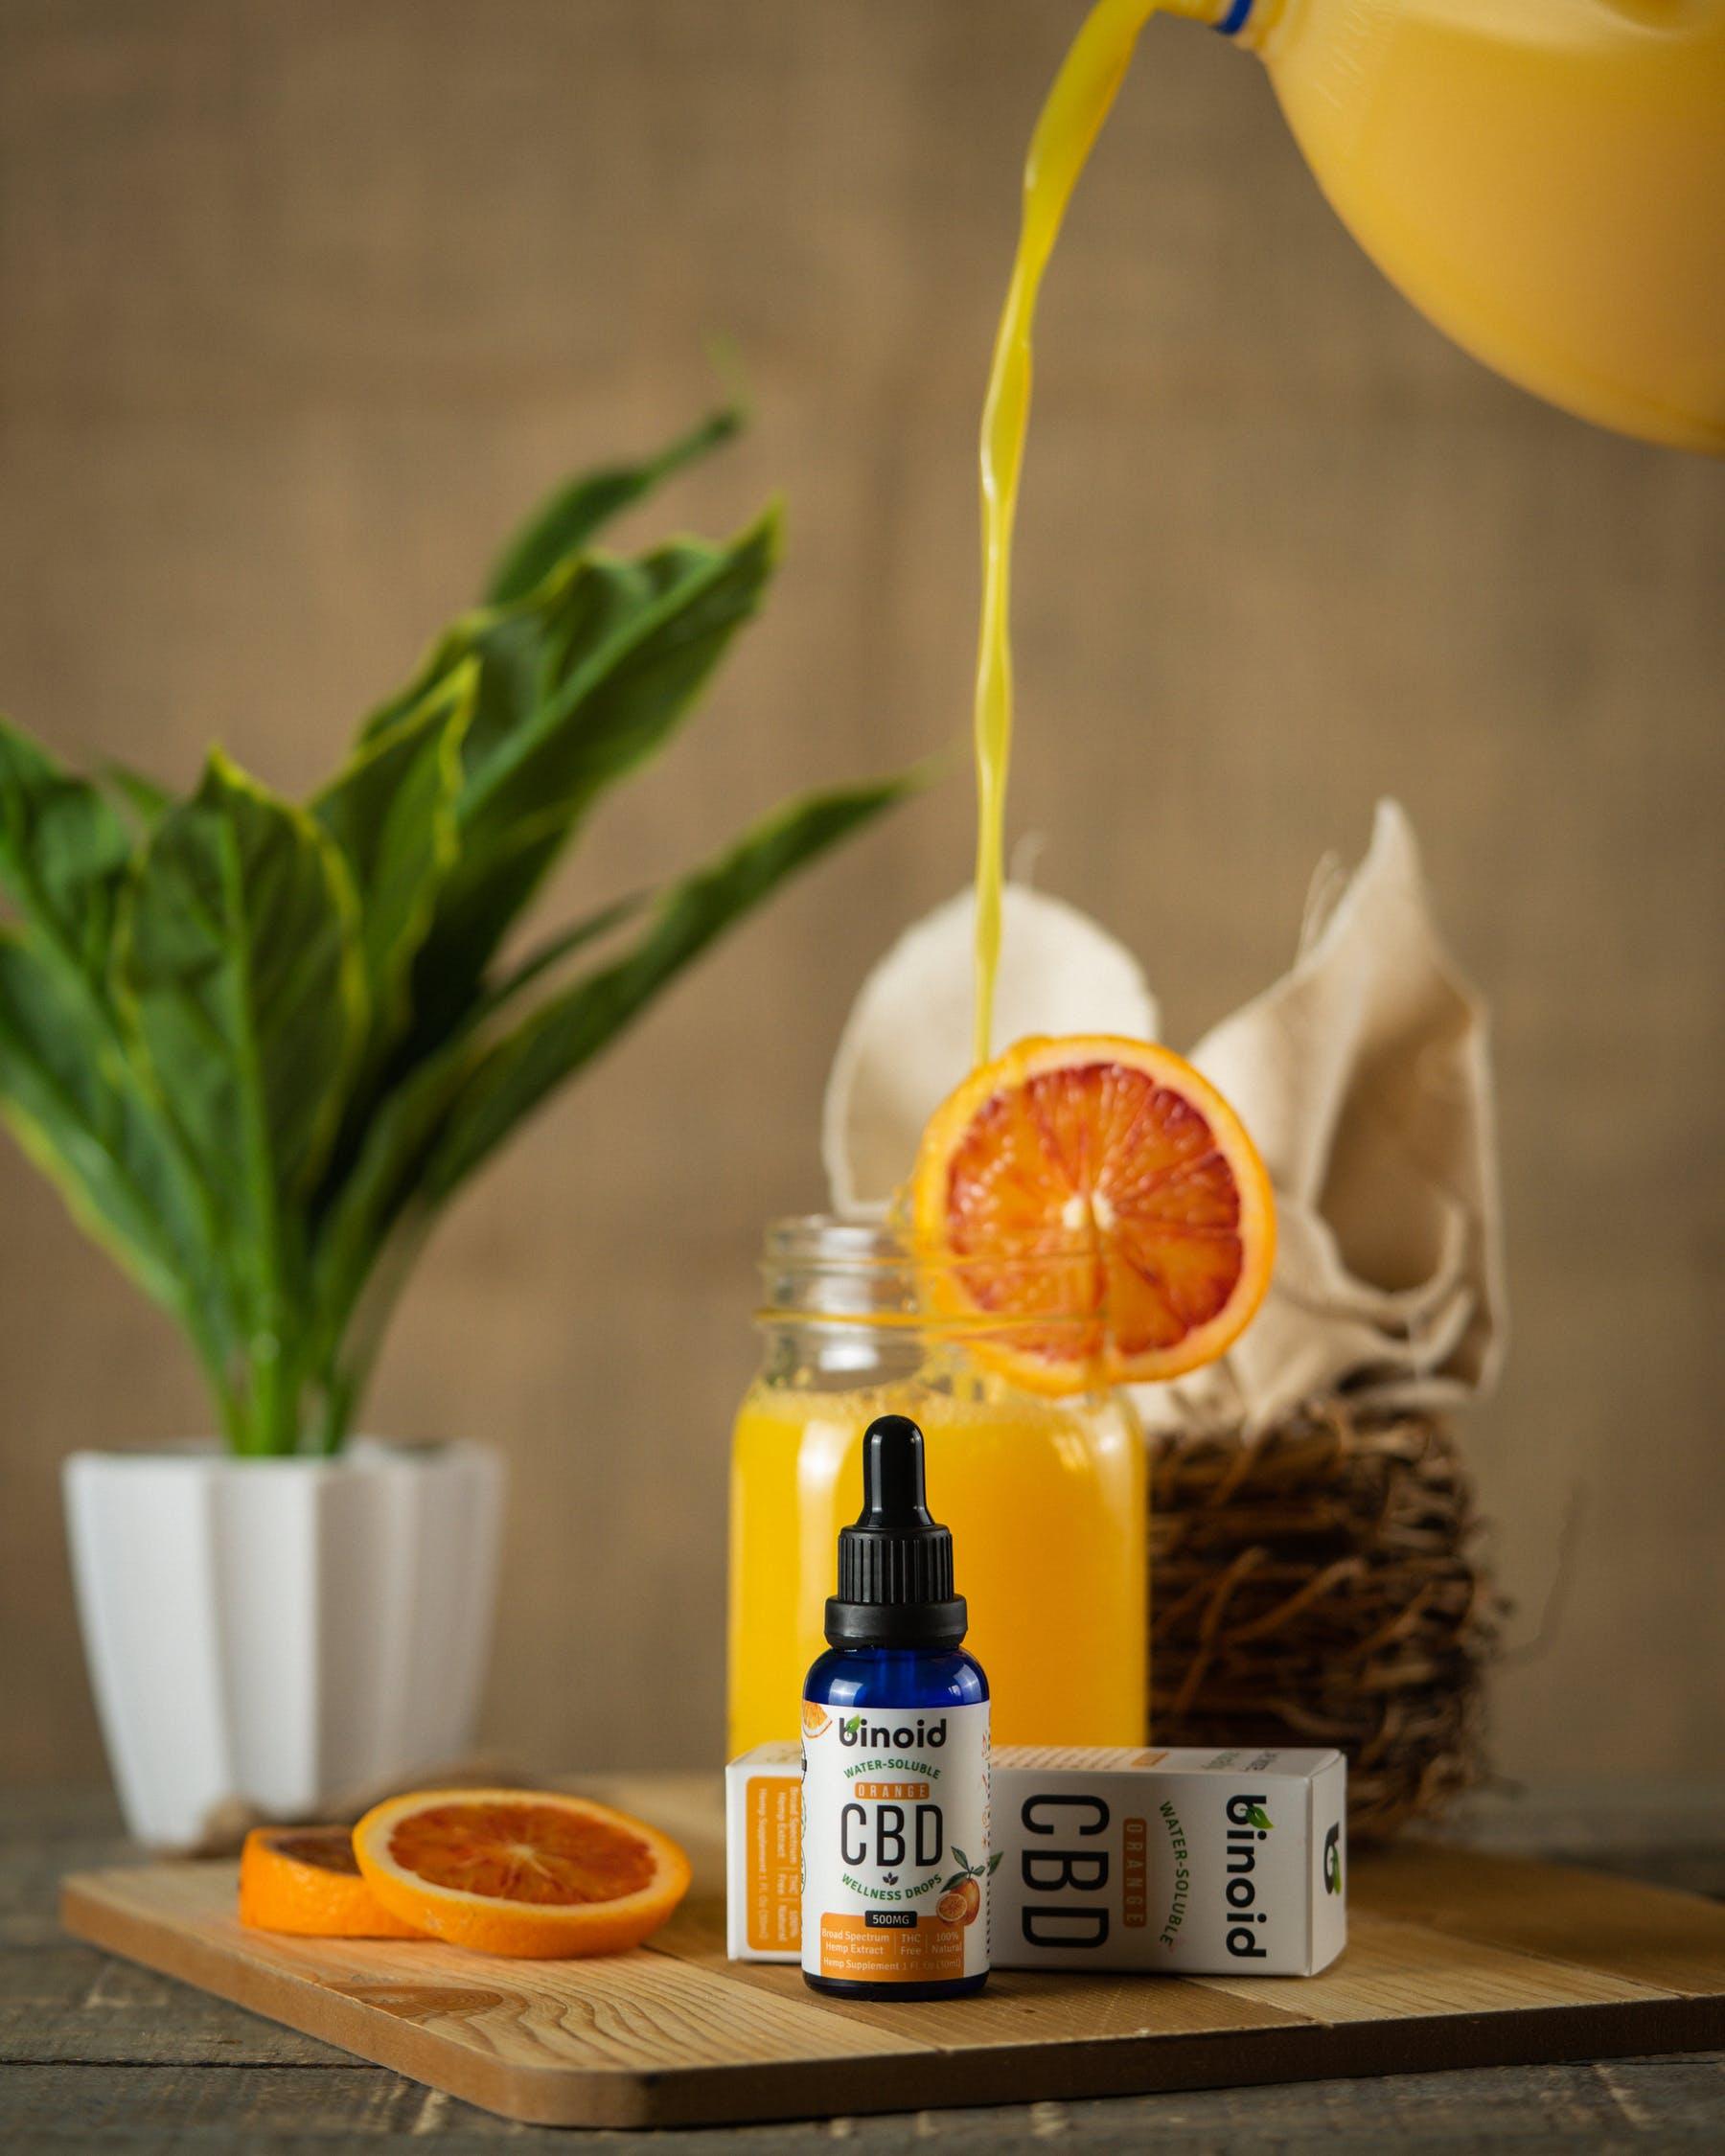 cbd oil and orange